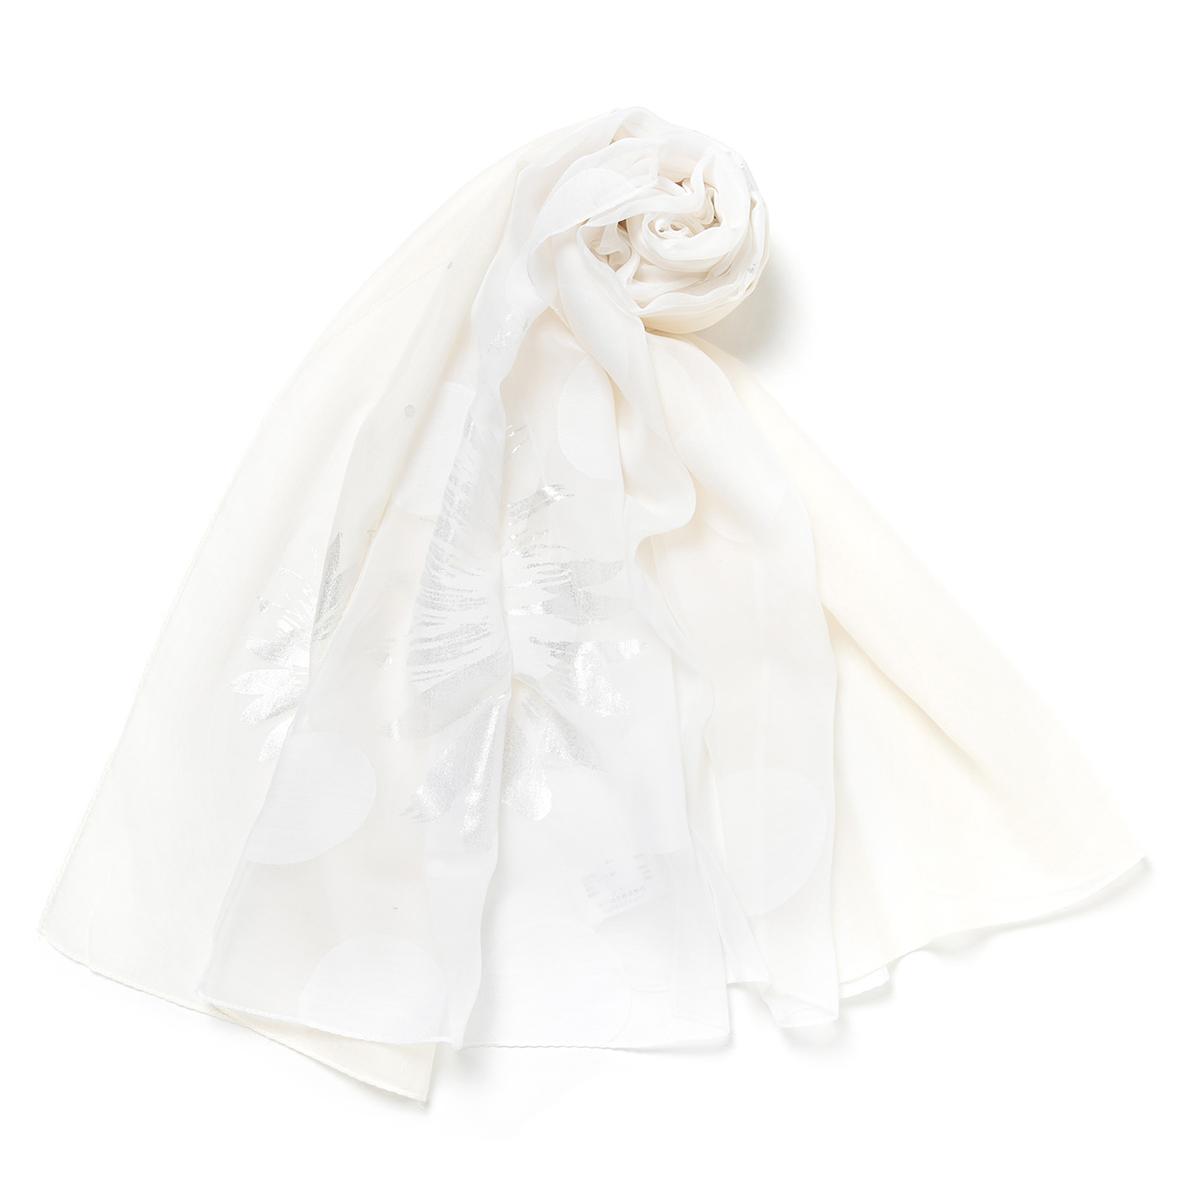 【ANTEPRIMA公式】アンテプリマ/オパール箔プリントストール/オフホワイト/ANTEPRIMA/E2AN632200/OFF WHITE